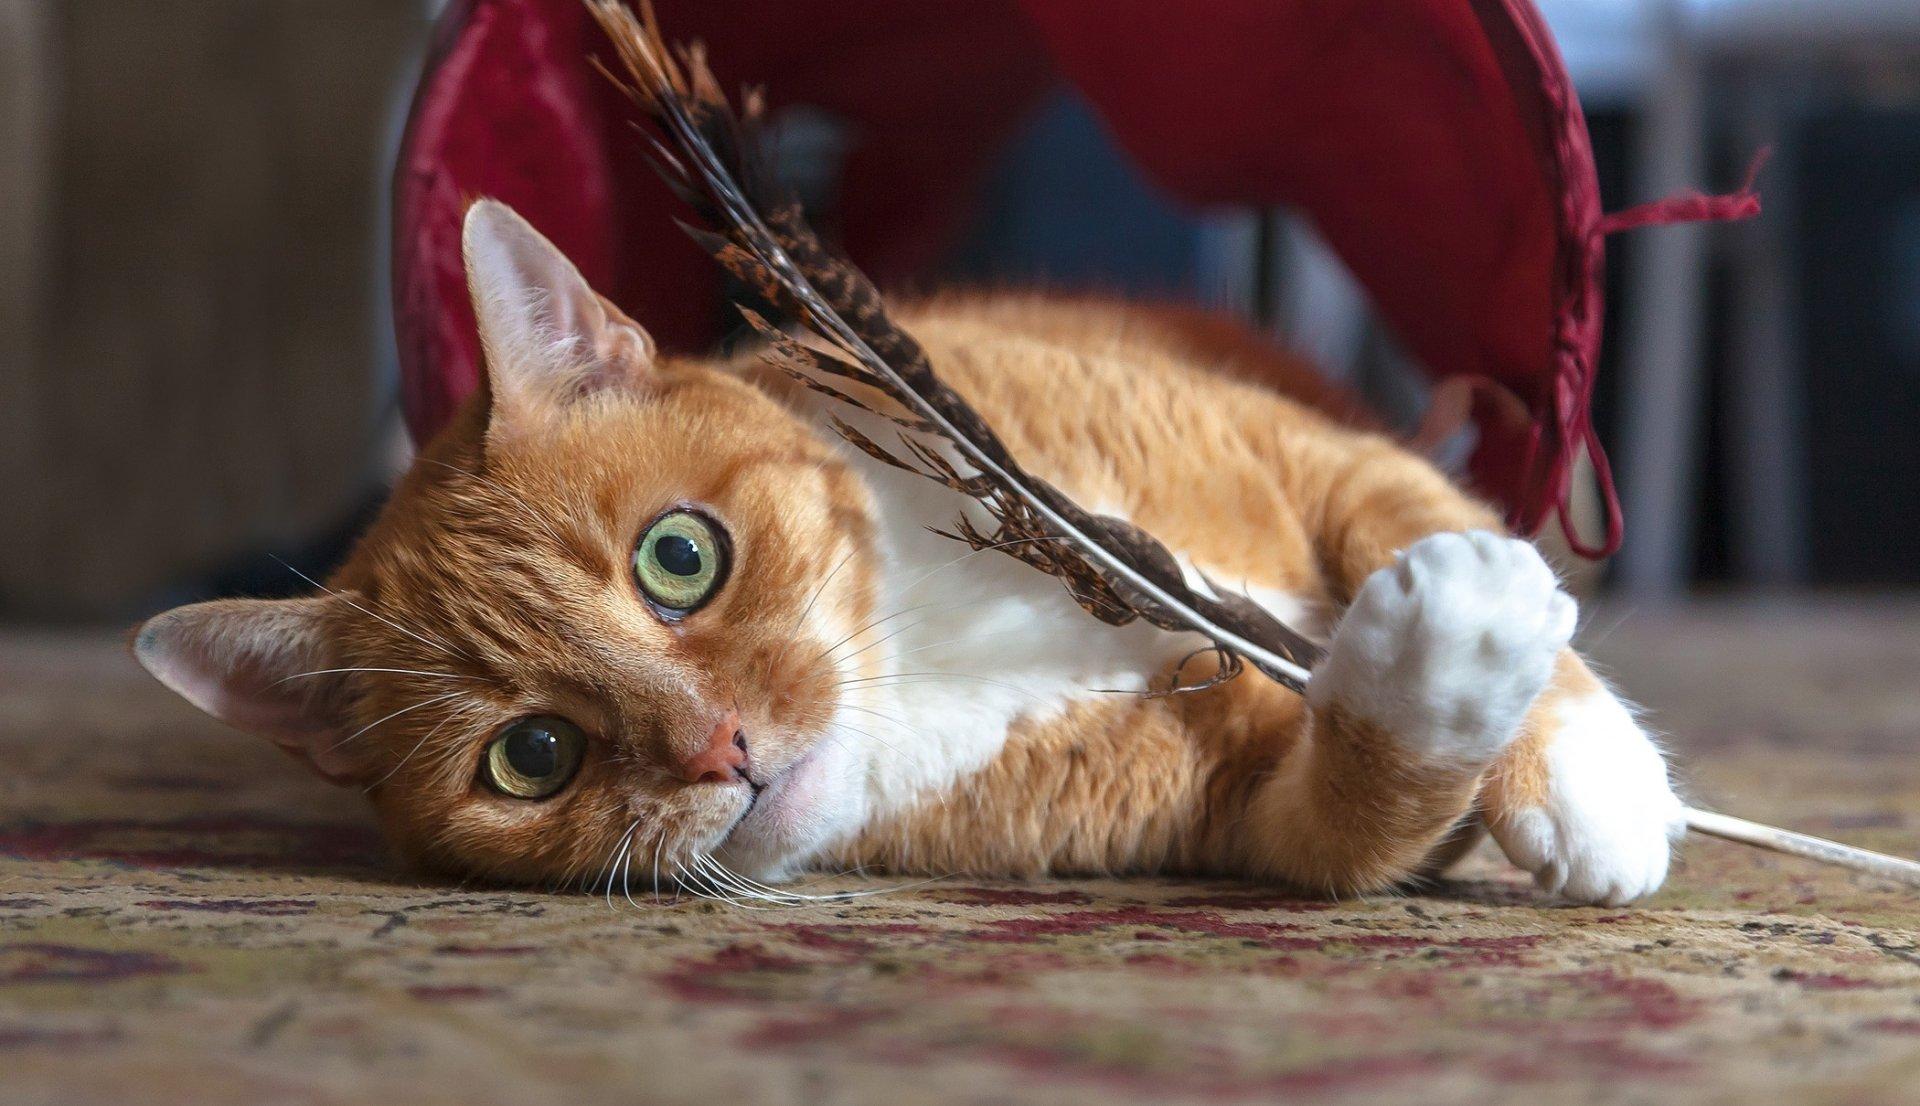 Animali - Gatto  Pet Sfondo